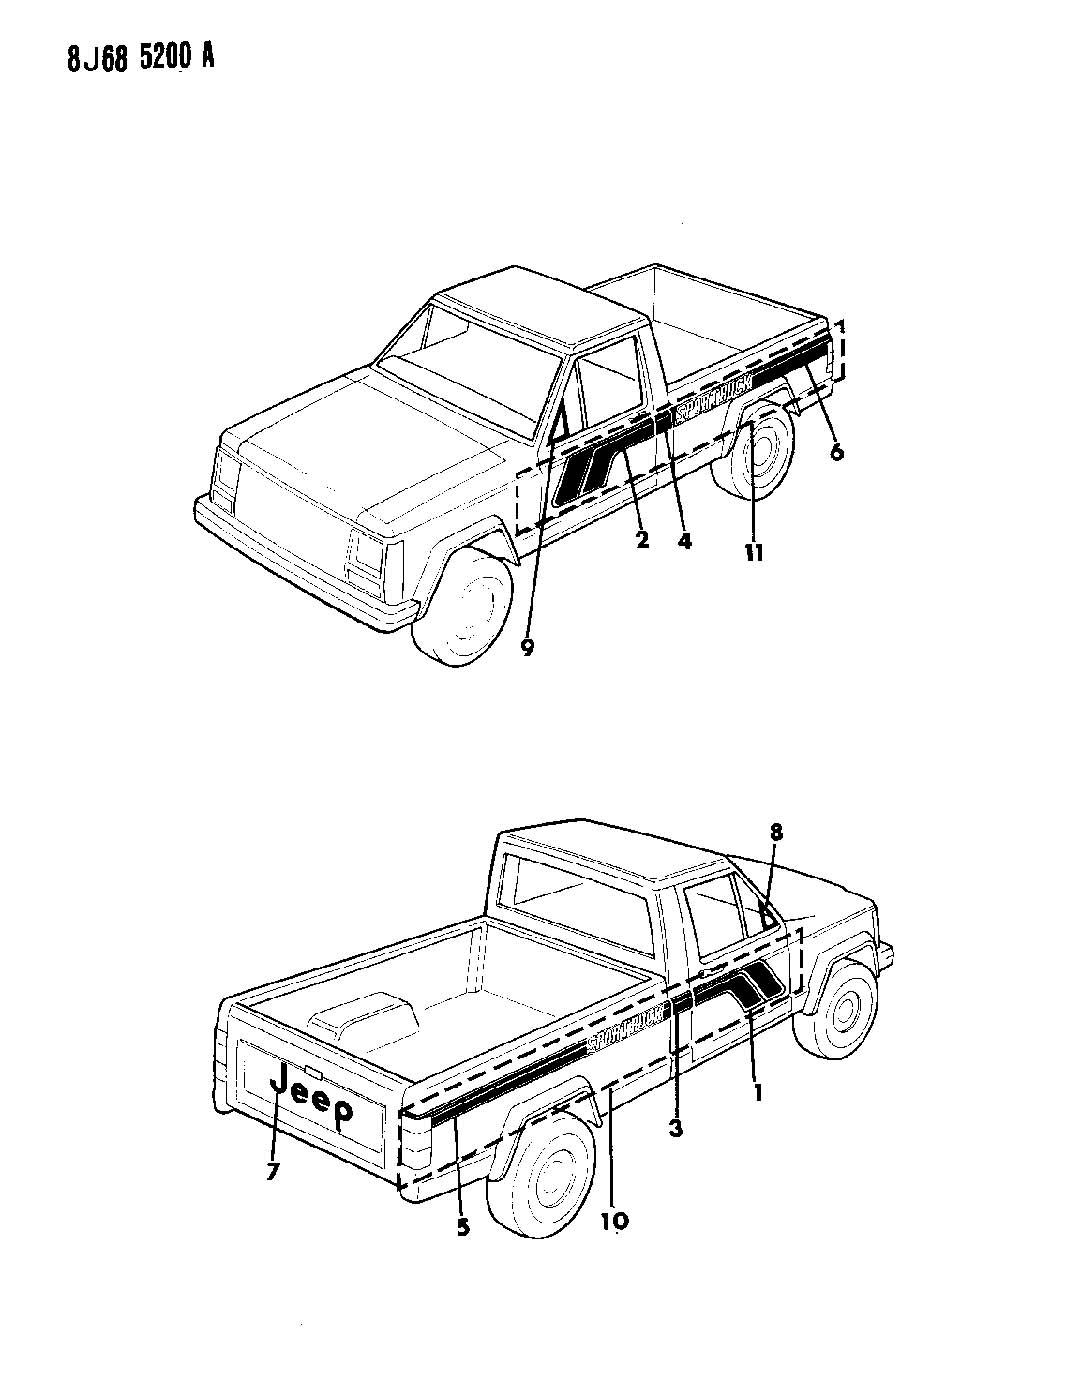 Jeep Comanche Decals Exterior Sportruck Comanche